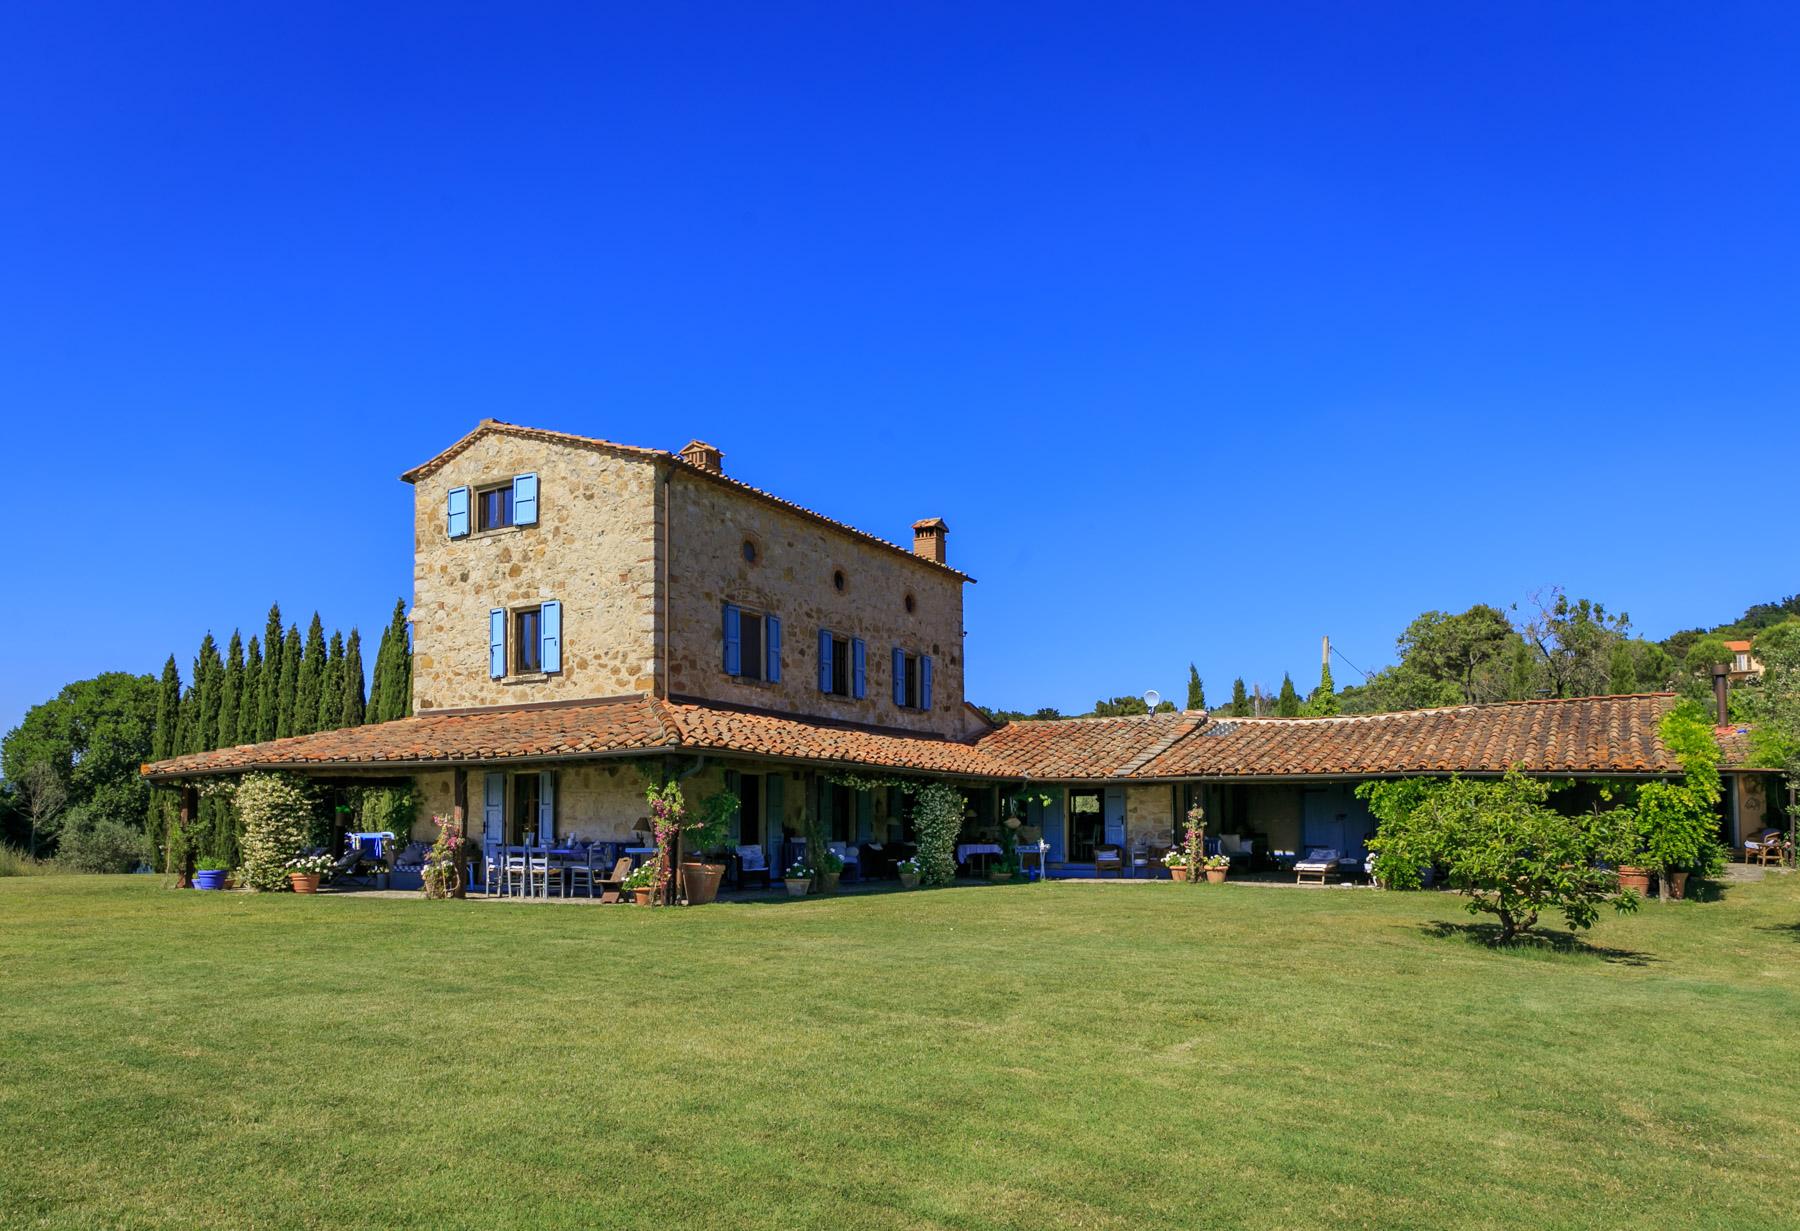 Villa in Vendita a Santa Luce: 5 locali, 270 mq - Foto 5